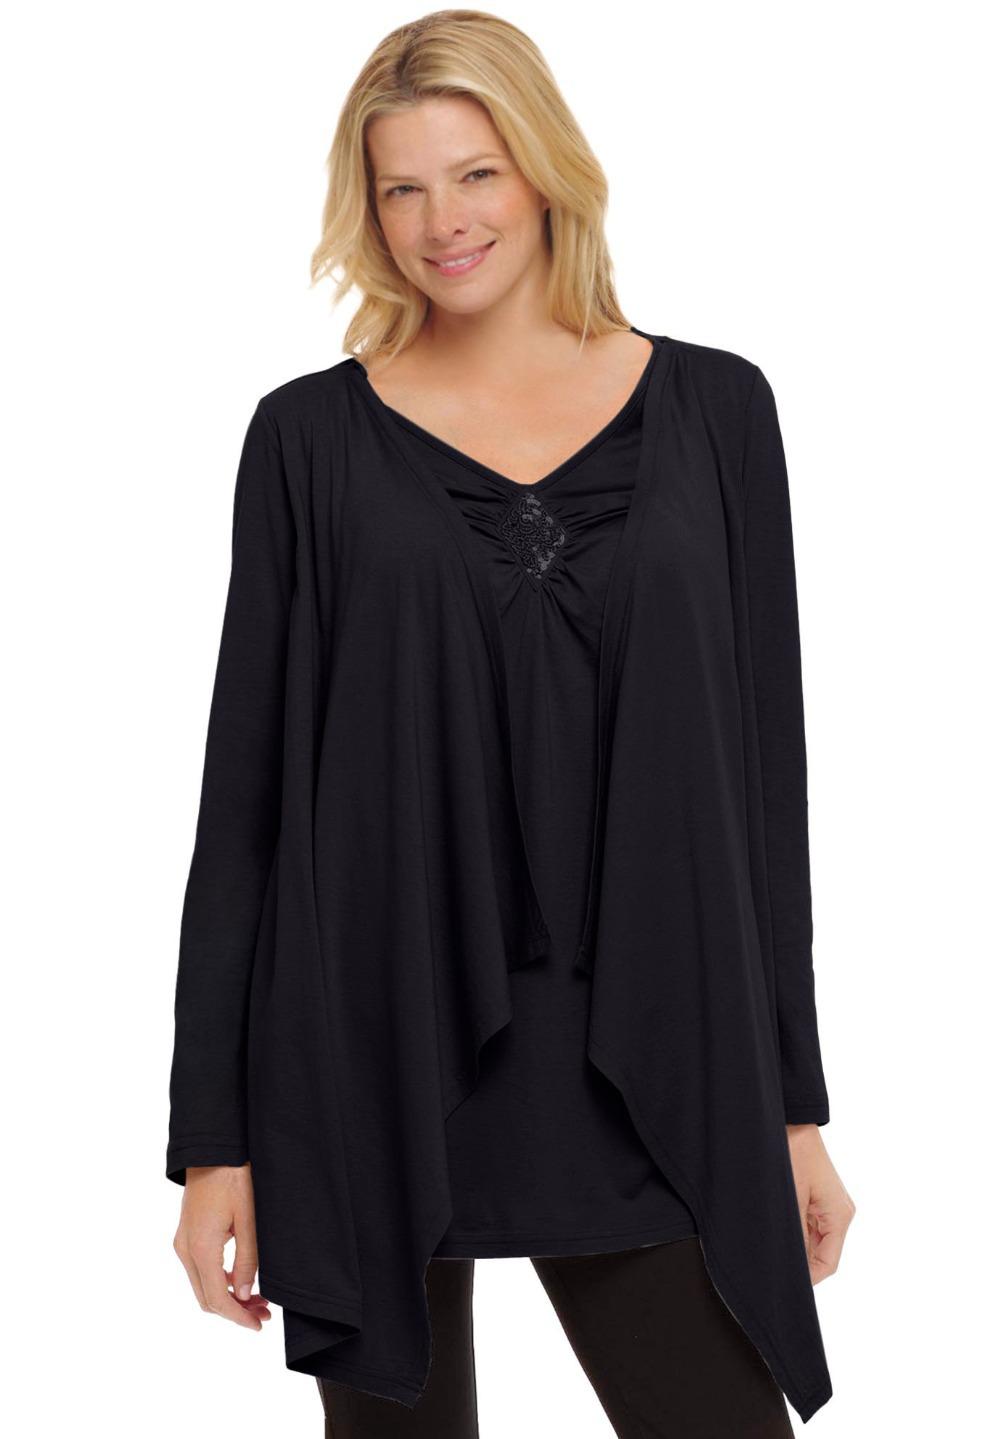 L 8xl Casual Layered Sequin Top Tee T Shirt Tunic Plus Big